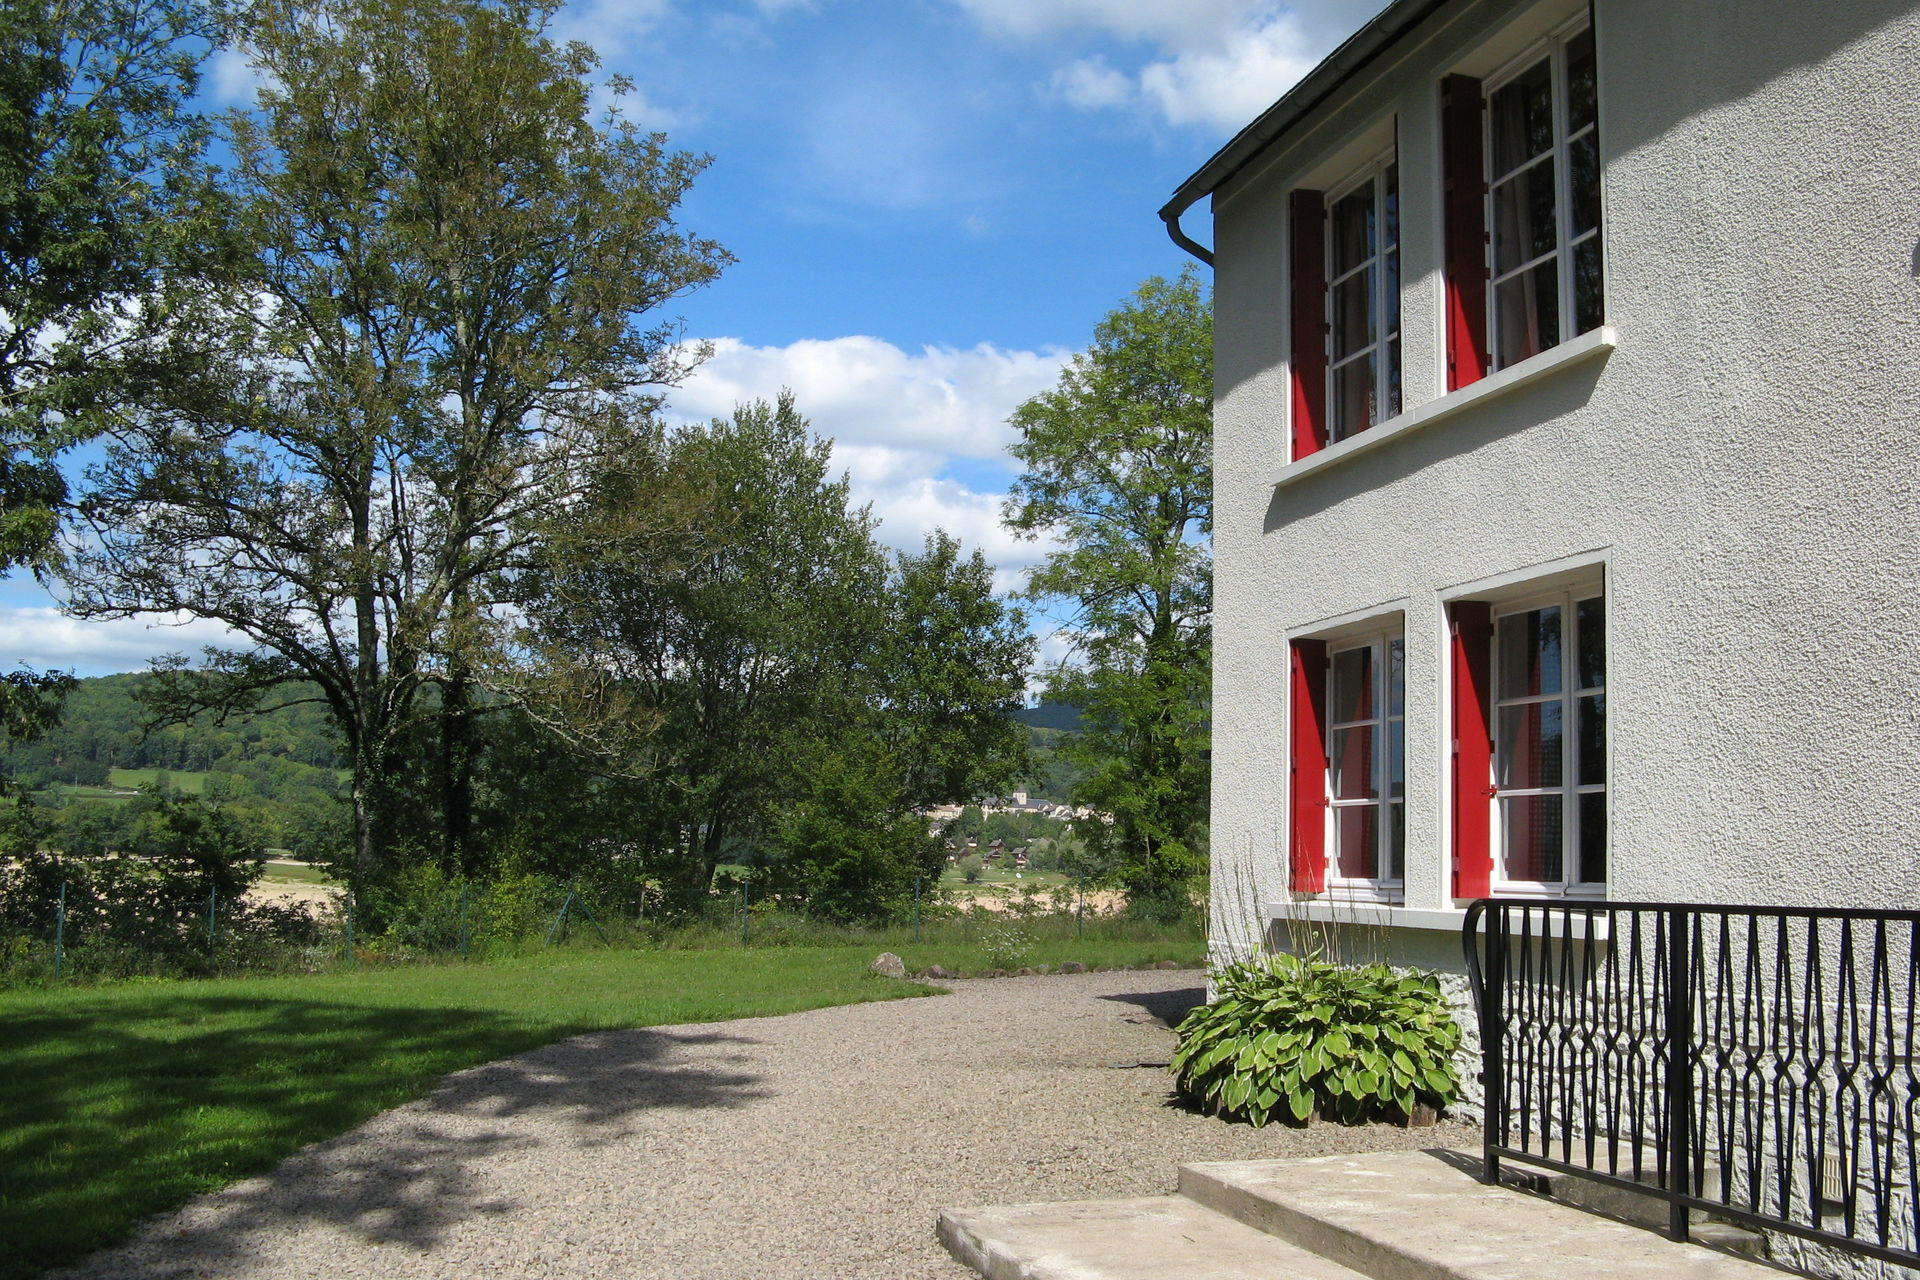 Bekijk vakantiehuis au bord du lac in ni vre bourgogne - Hoe dicht terras ...